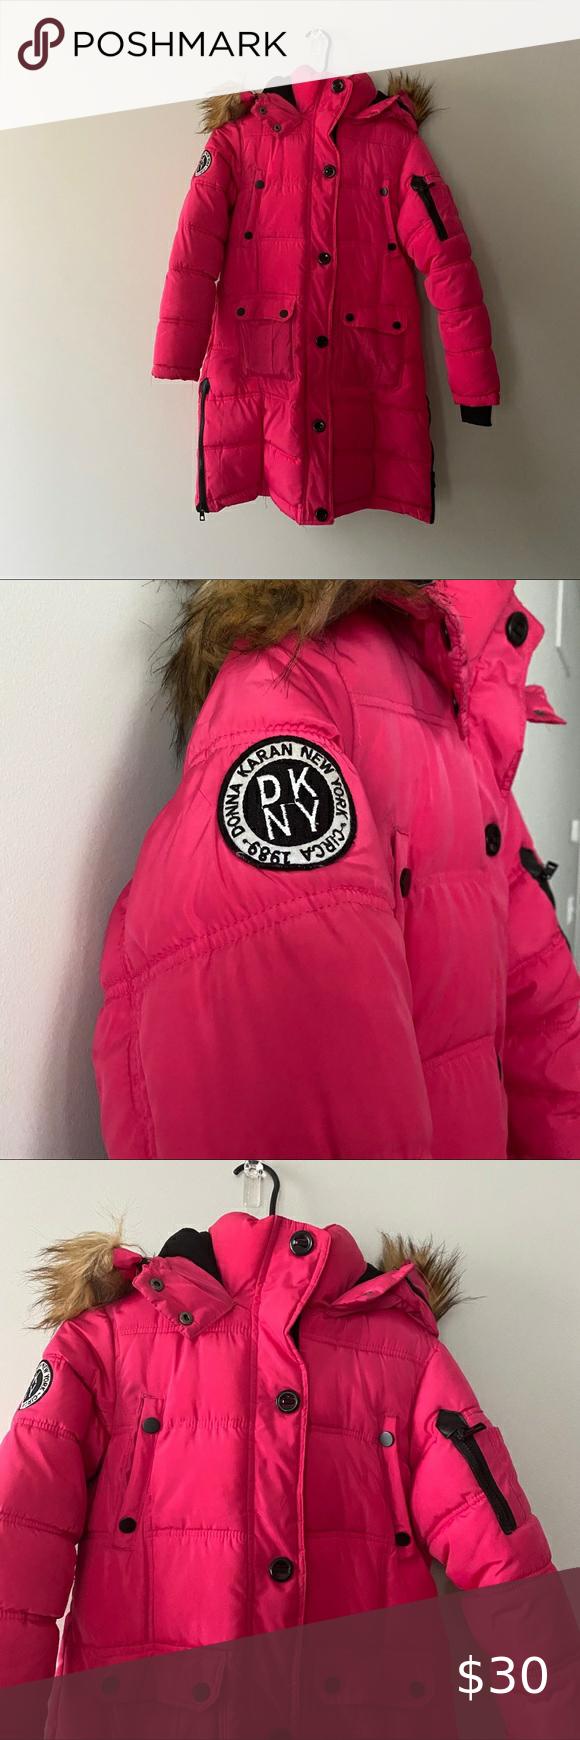 Dkny Girls Winter Coat 14 16 Dkny Girls Quilted Winter Coat W Fur Trim Hood Pink 14 16 Large Dkny Jackets Co Girls Winter Coats Winter Coat Clothes Design [ 1740 x 580 Pixel ]